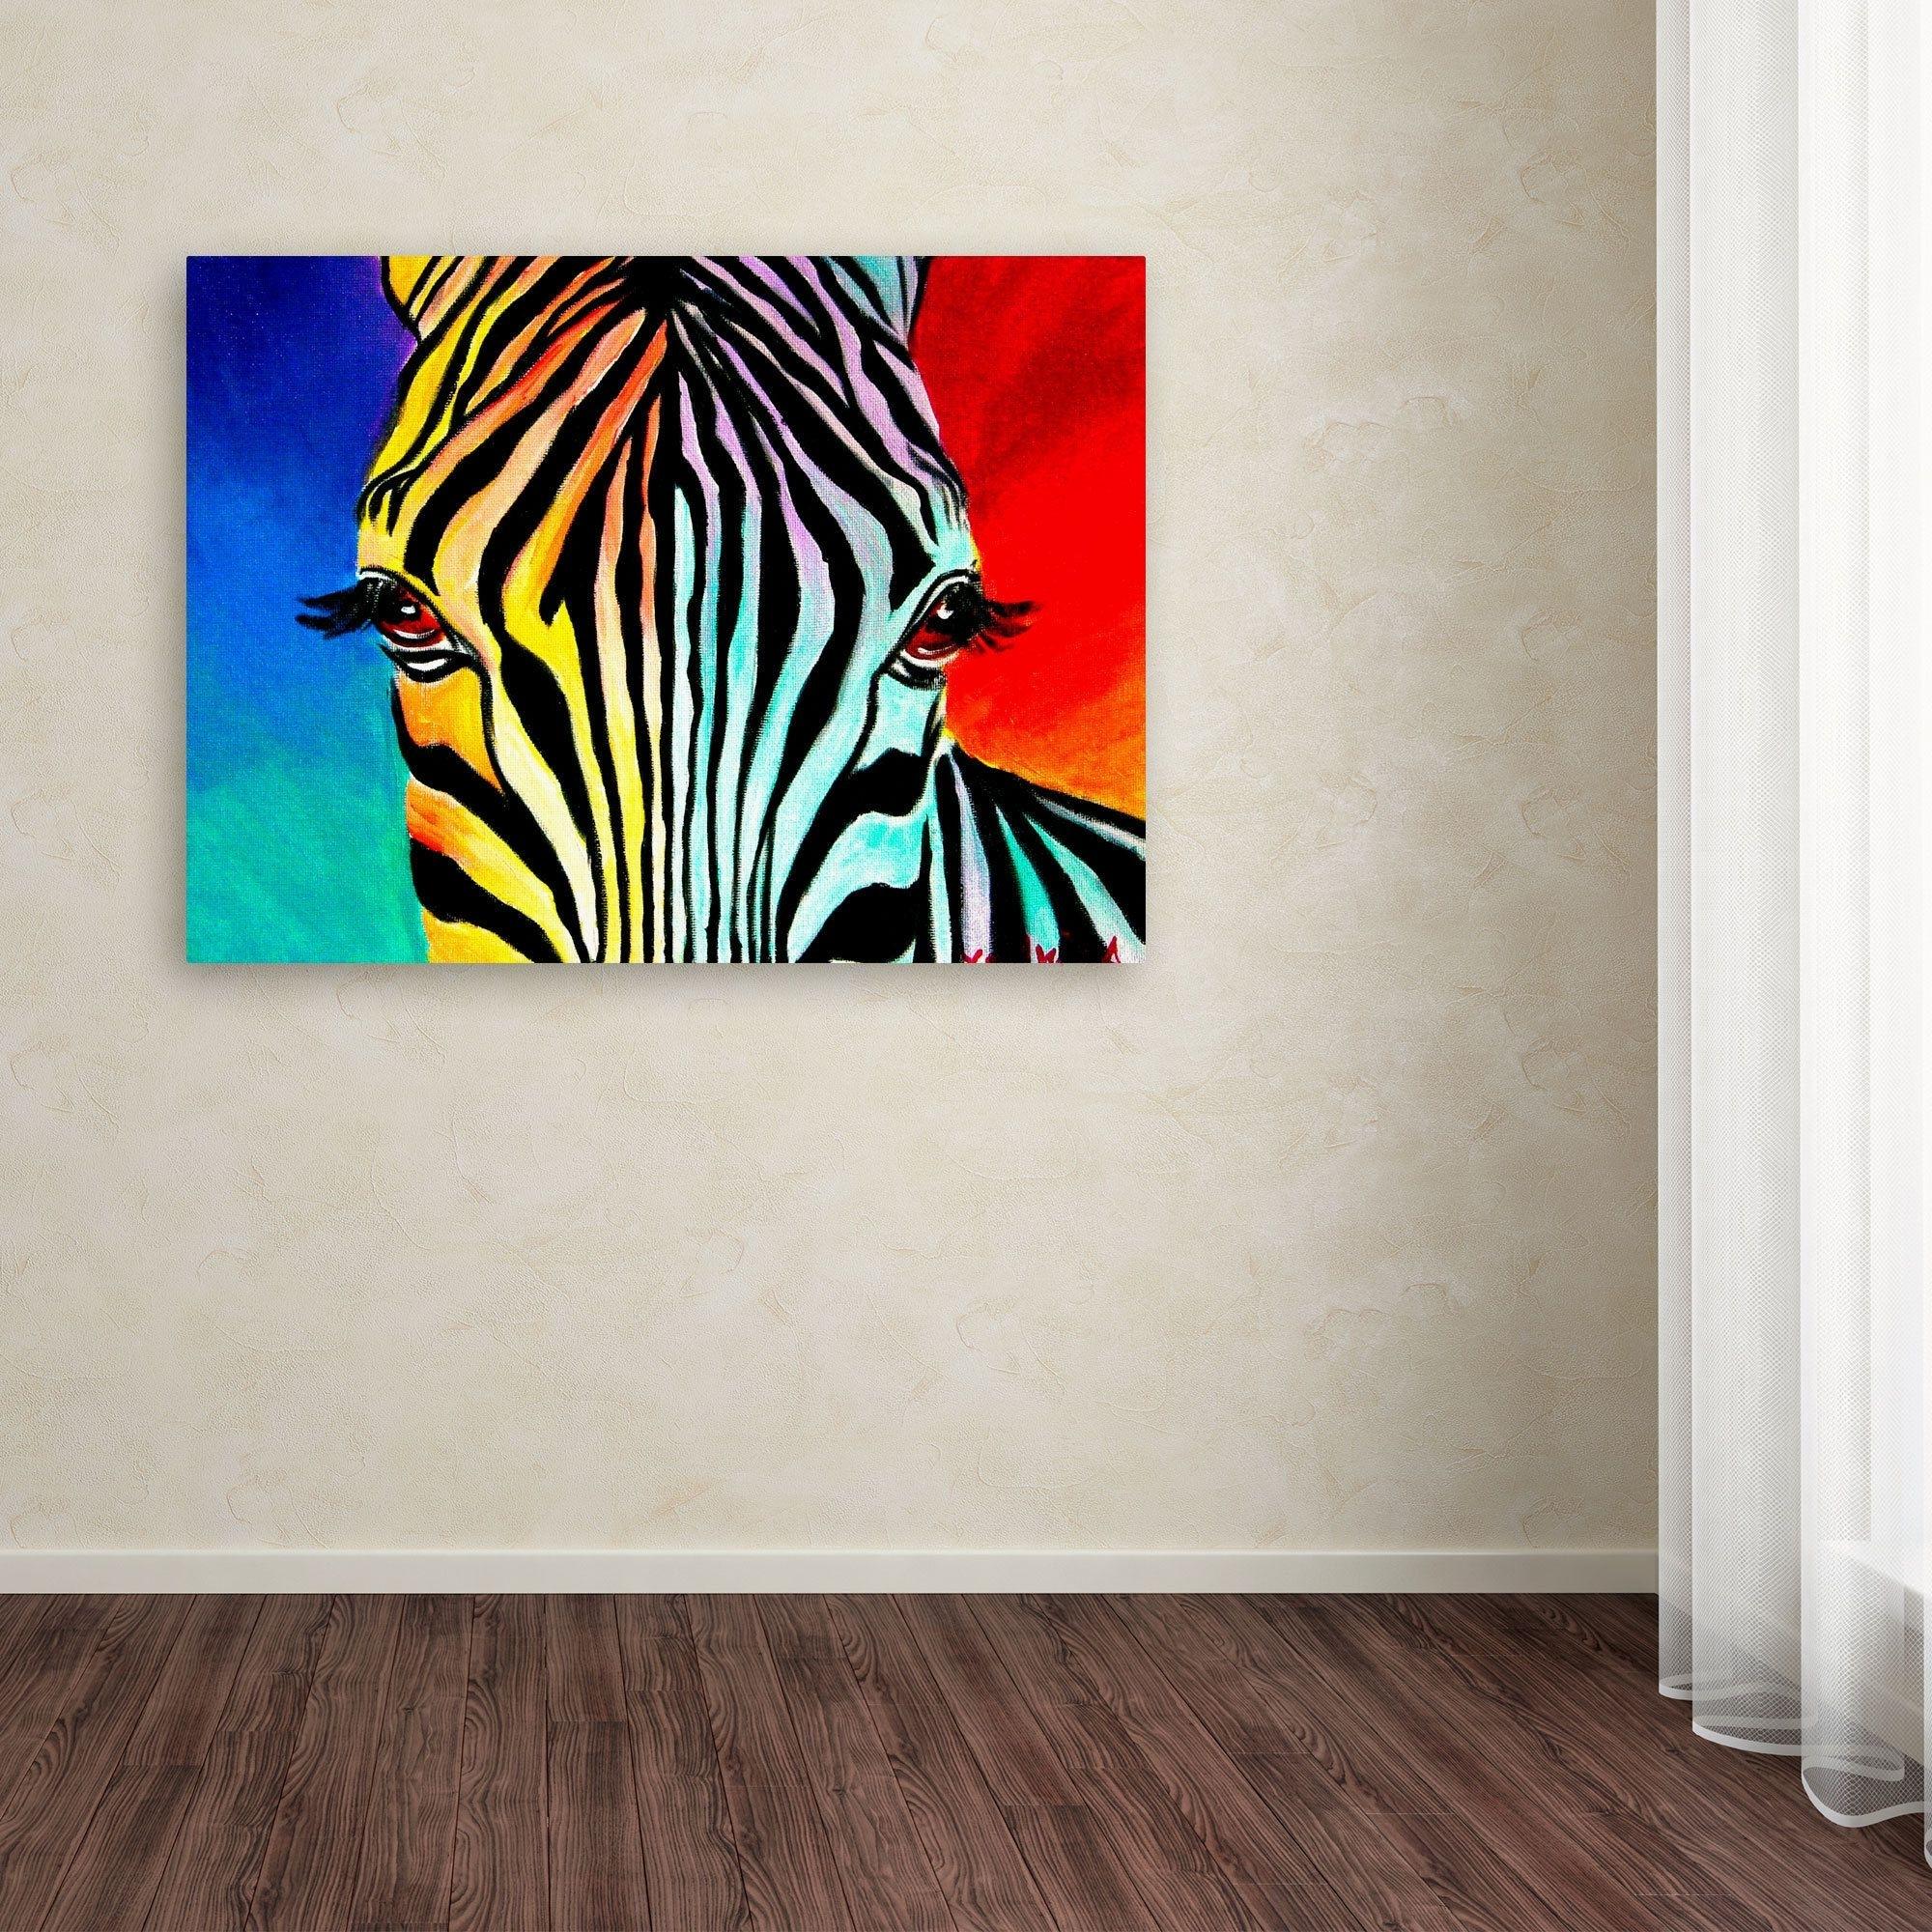 Dawgart 'zebra' Canvas Art (View 11 of 15)